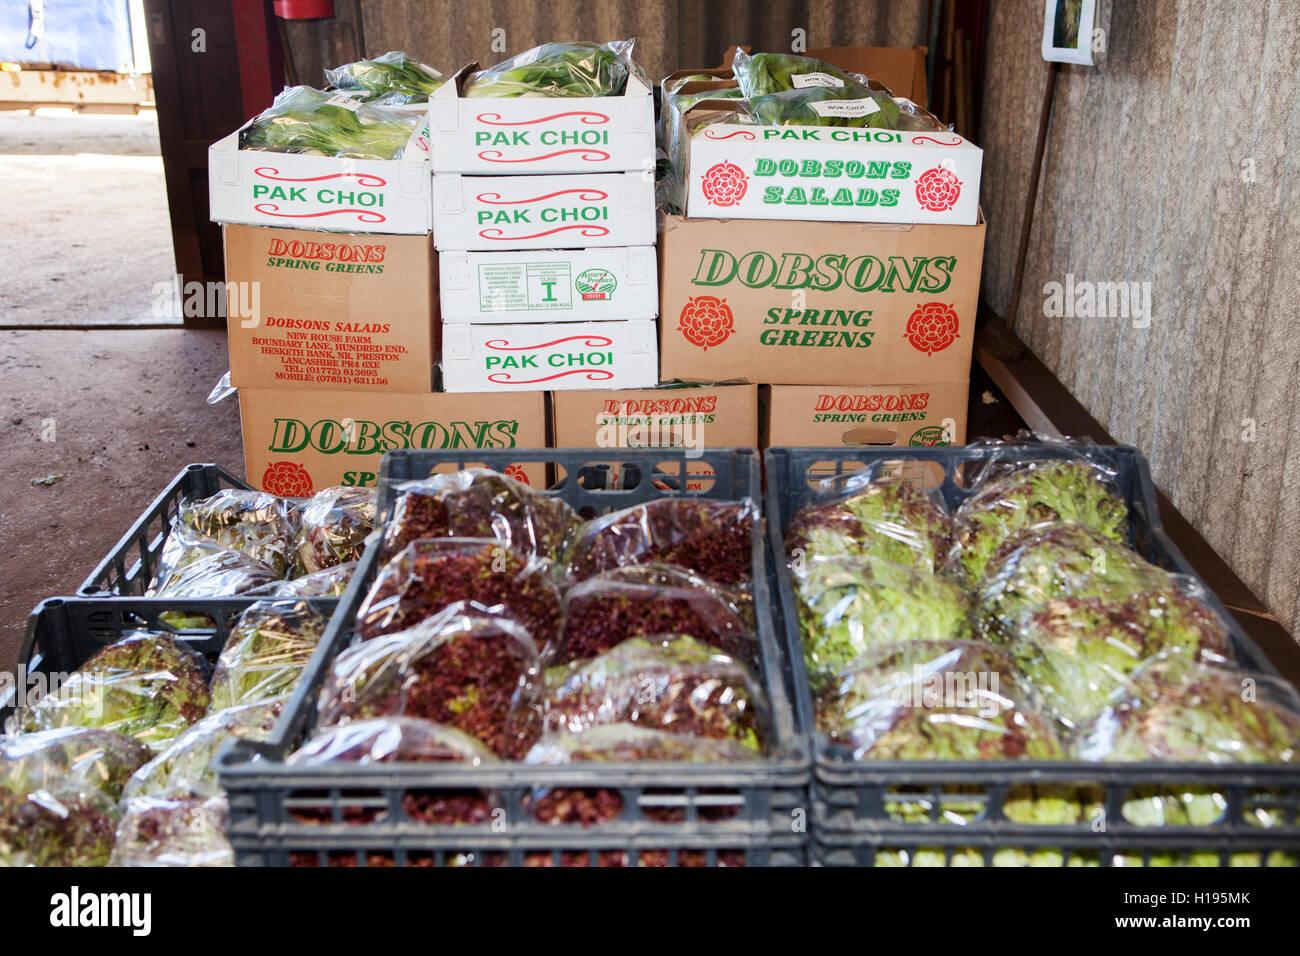 Salad Crops Stockfotos & Salad Crops Bilder - Alamy